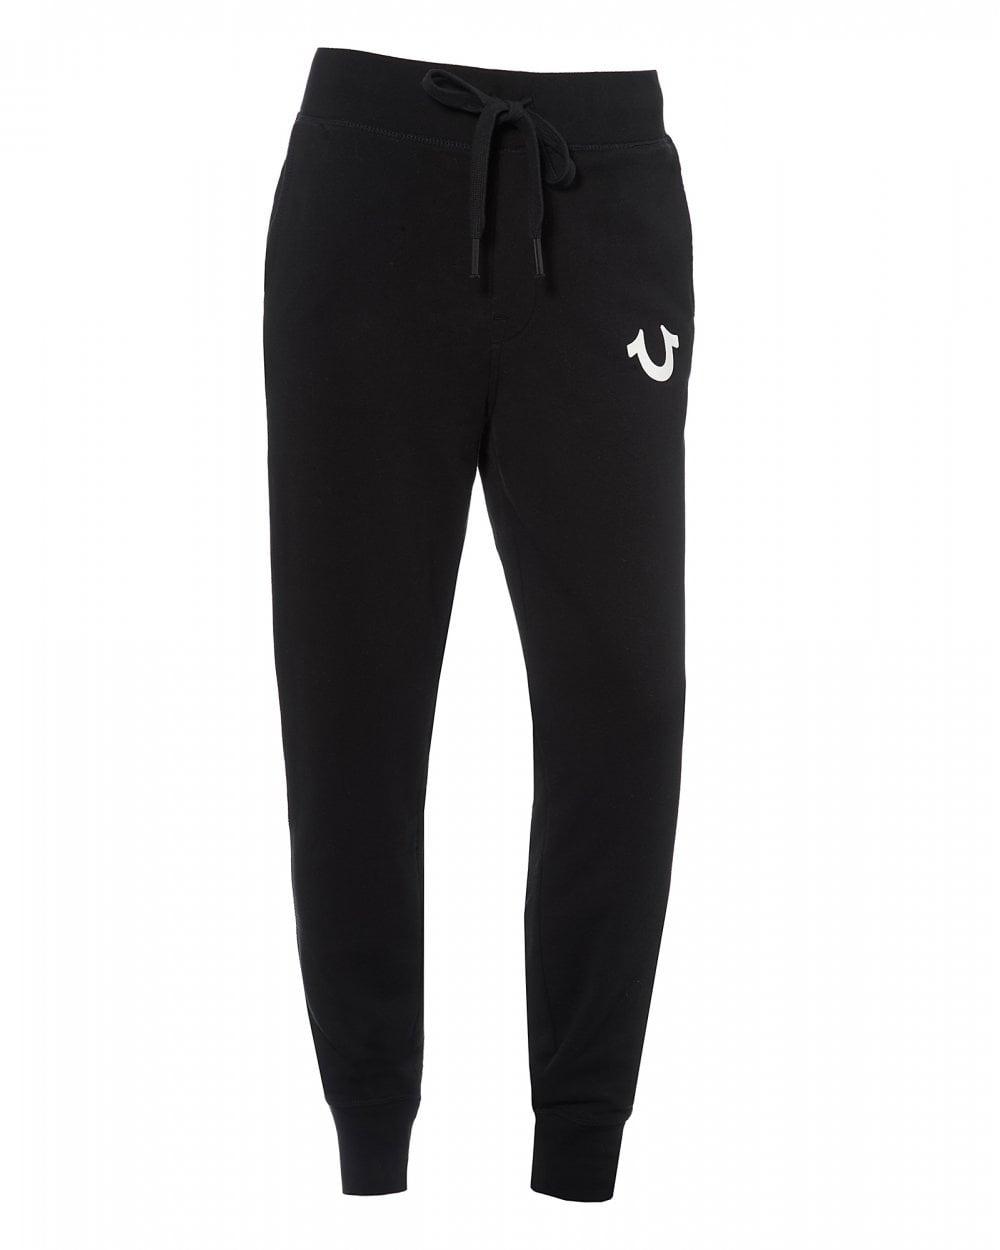 b511f379ef True Religion Mens Logo Cuffed Joggers, Black Sweatpants